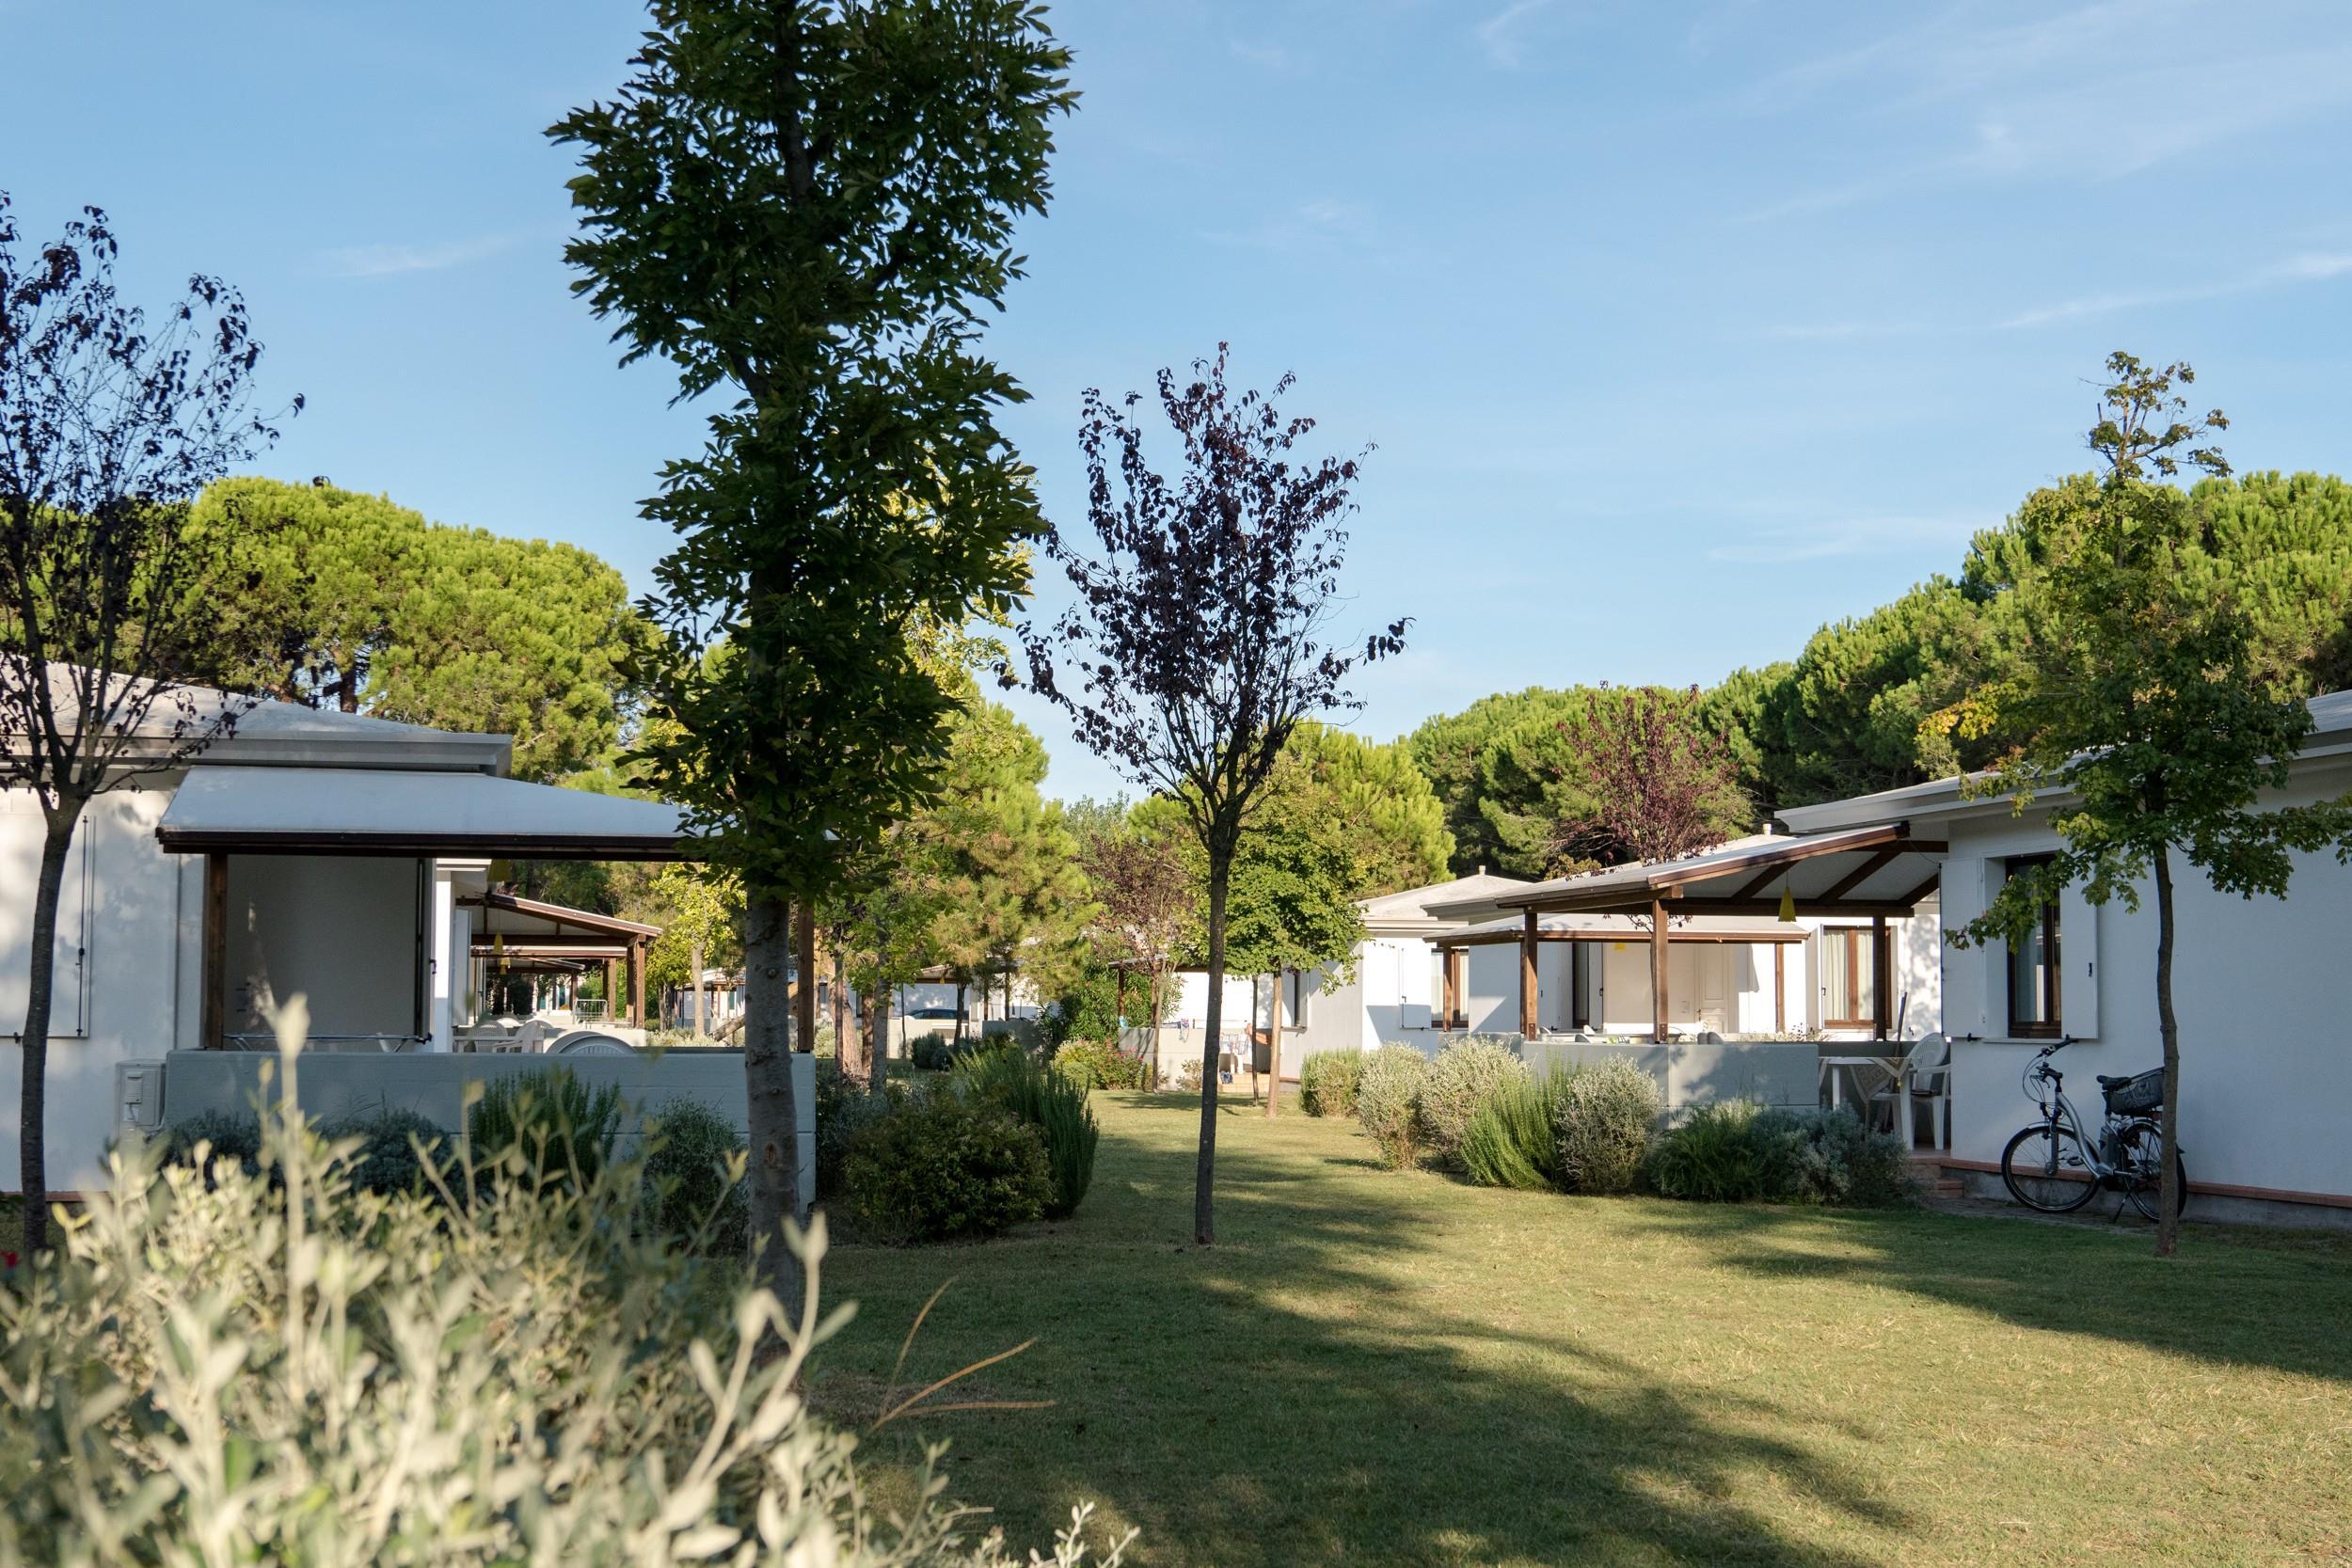 Location - Bungalow Comfort - Camping Ca' Savio